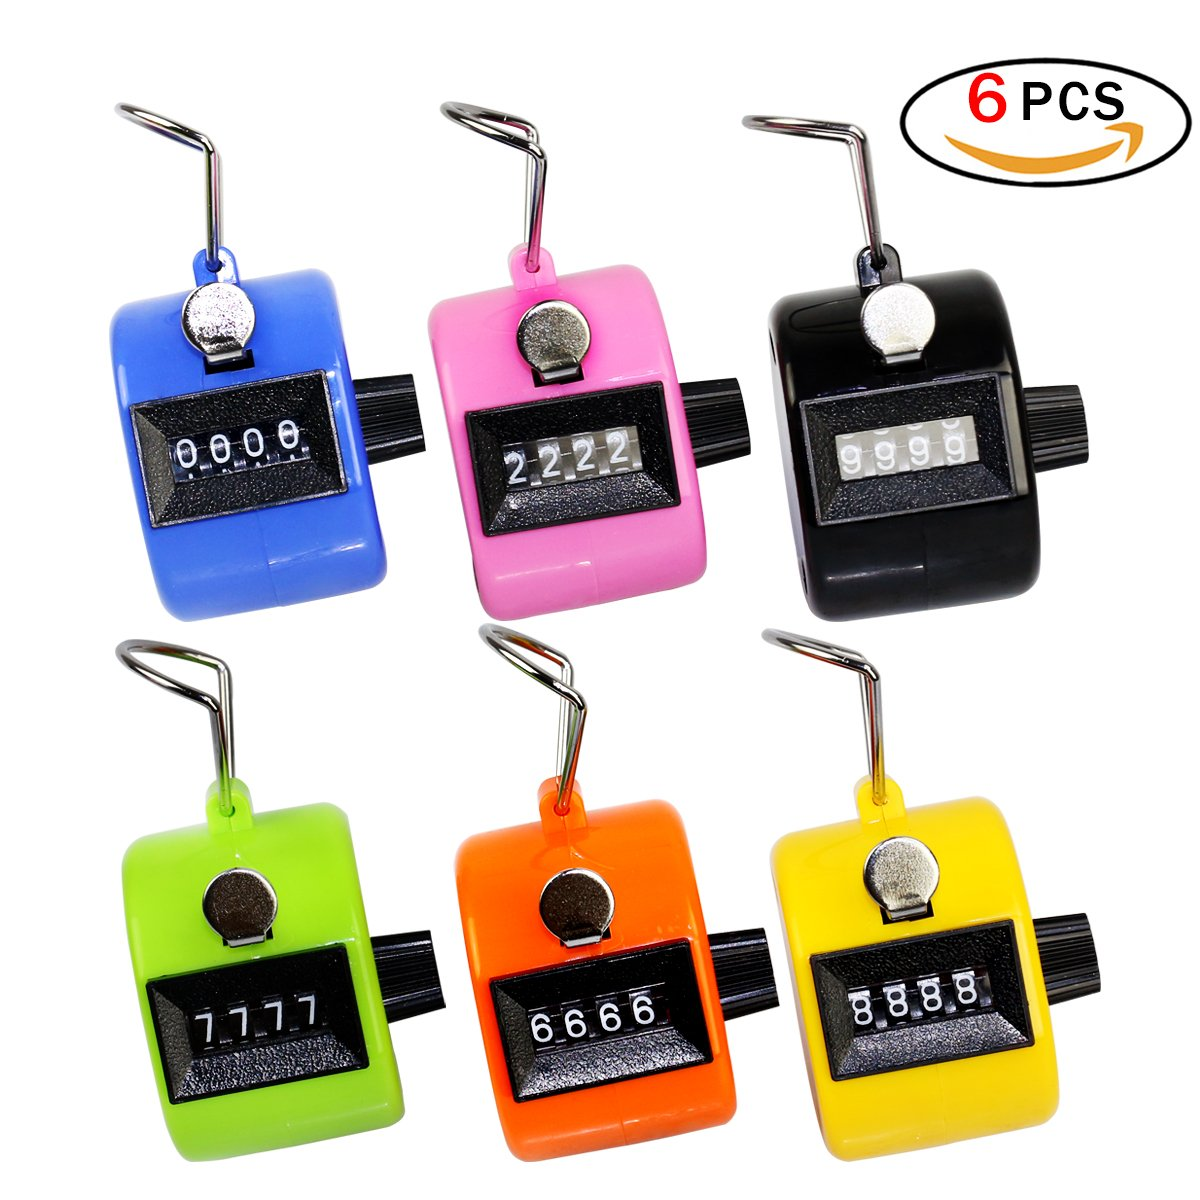 Ndier Contador Manual de Conteo de 6 dígitos Mecánicode de Mano Assorted Plastic Clicker de plástico (6 Paquetes)